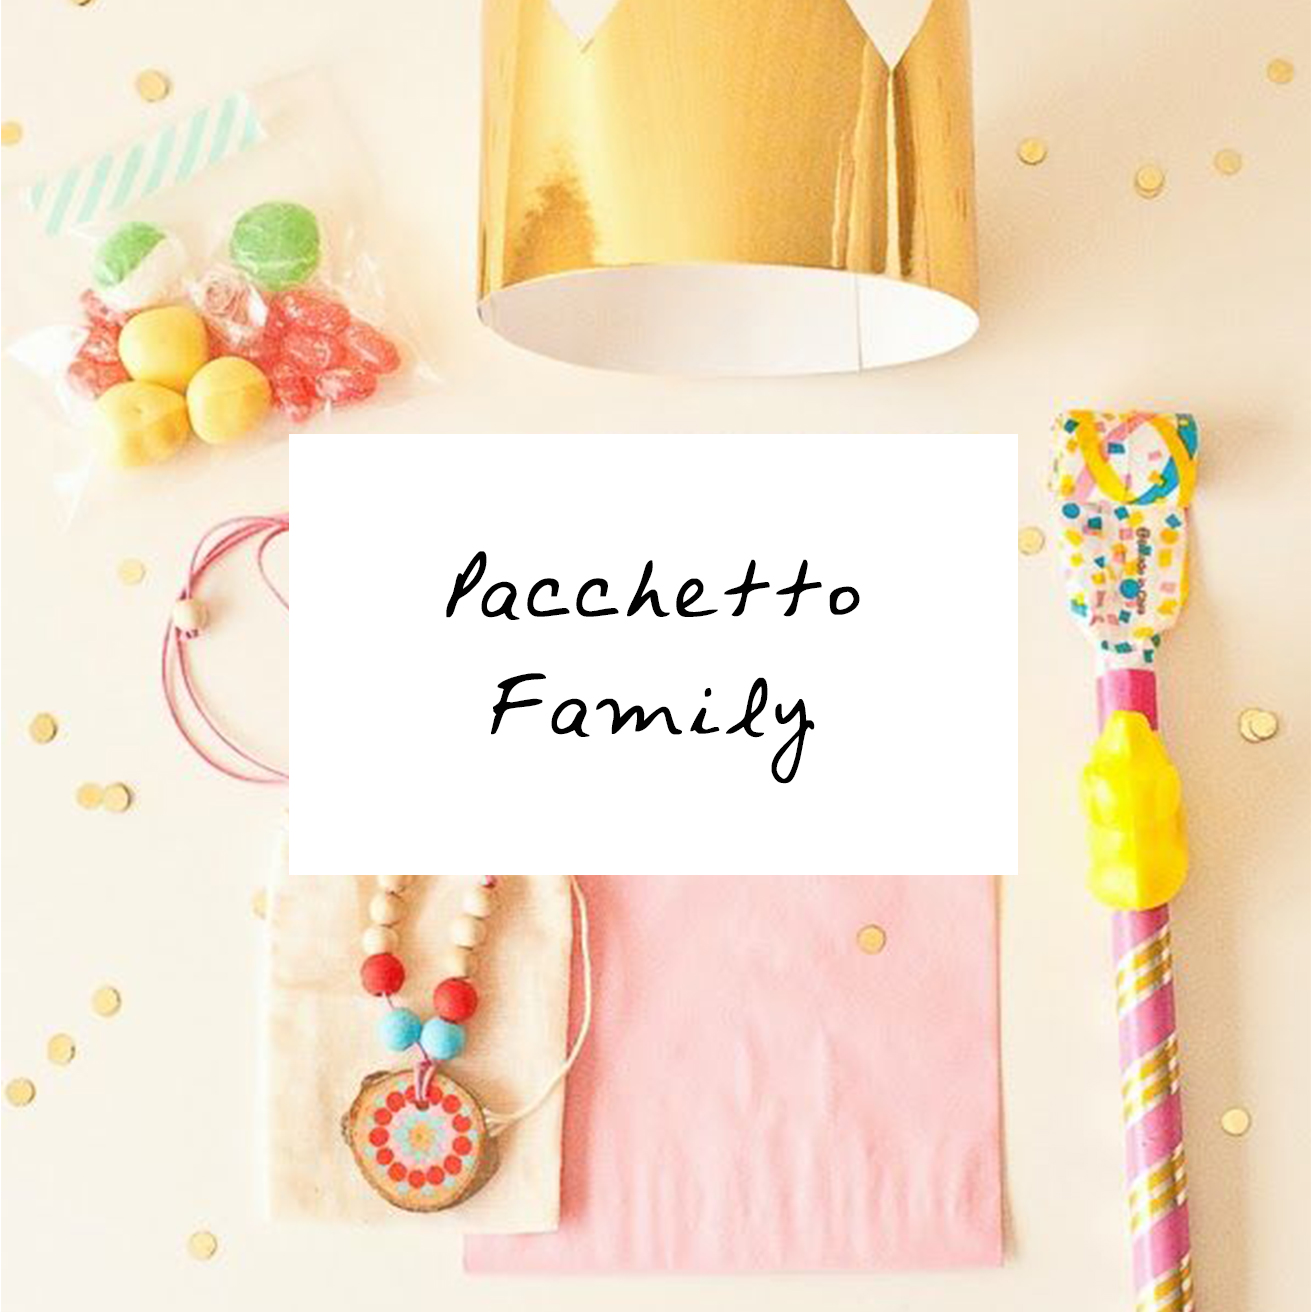 pacchetto-family